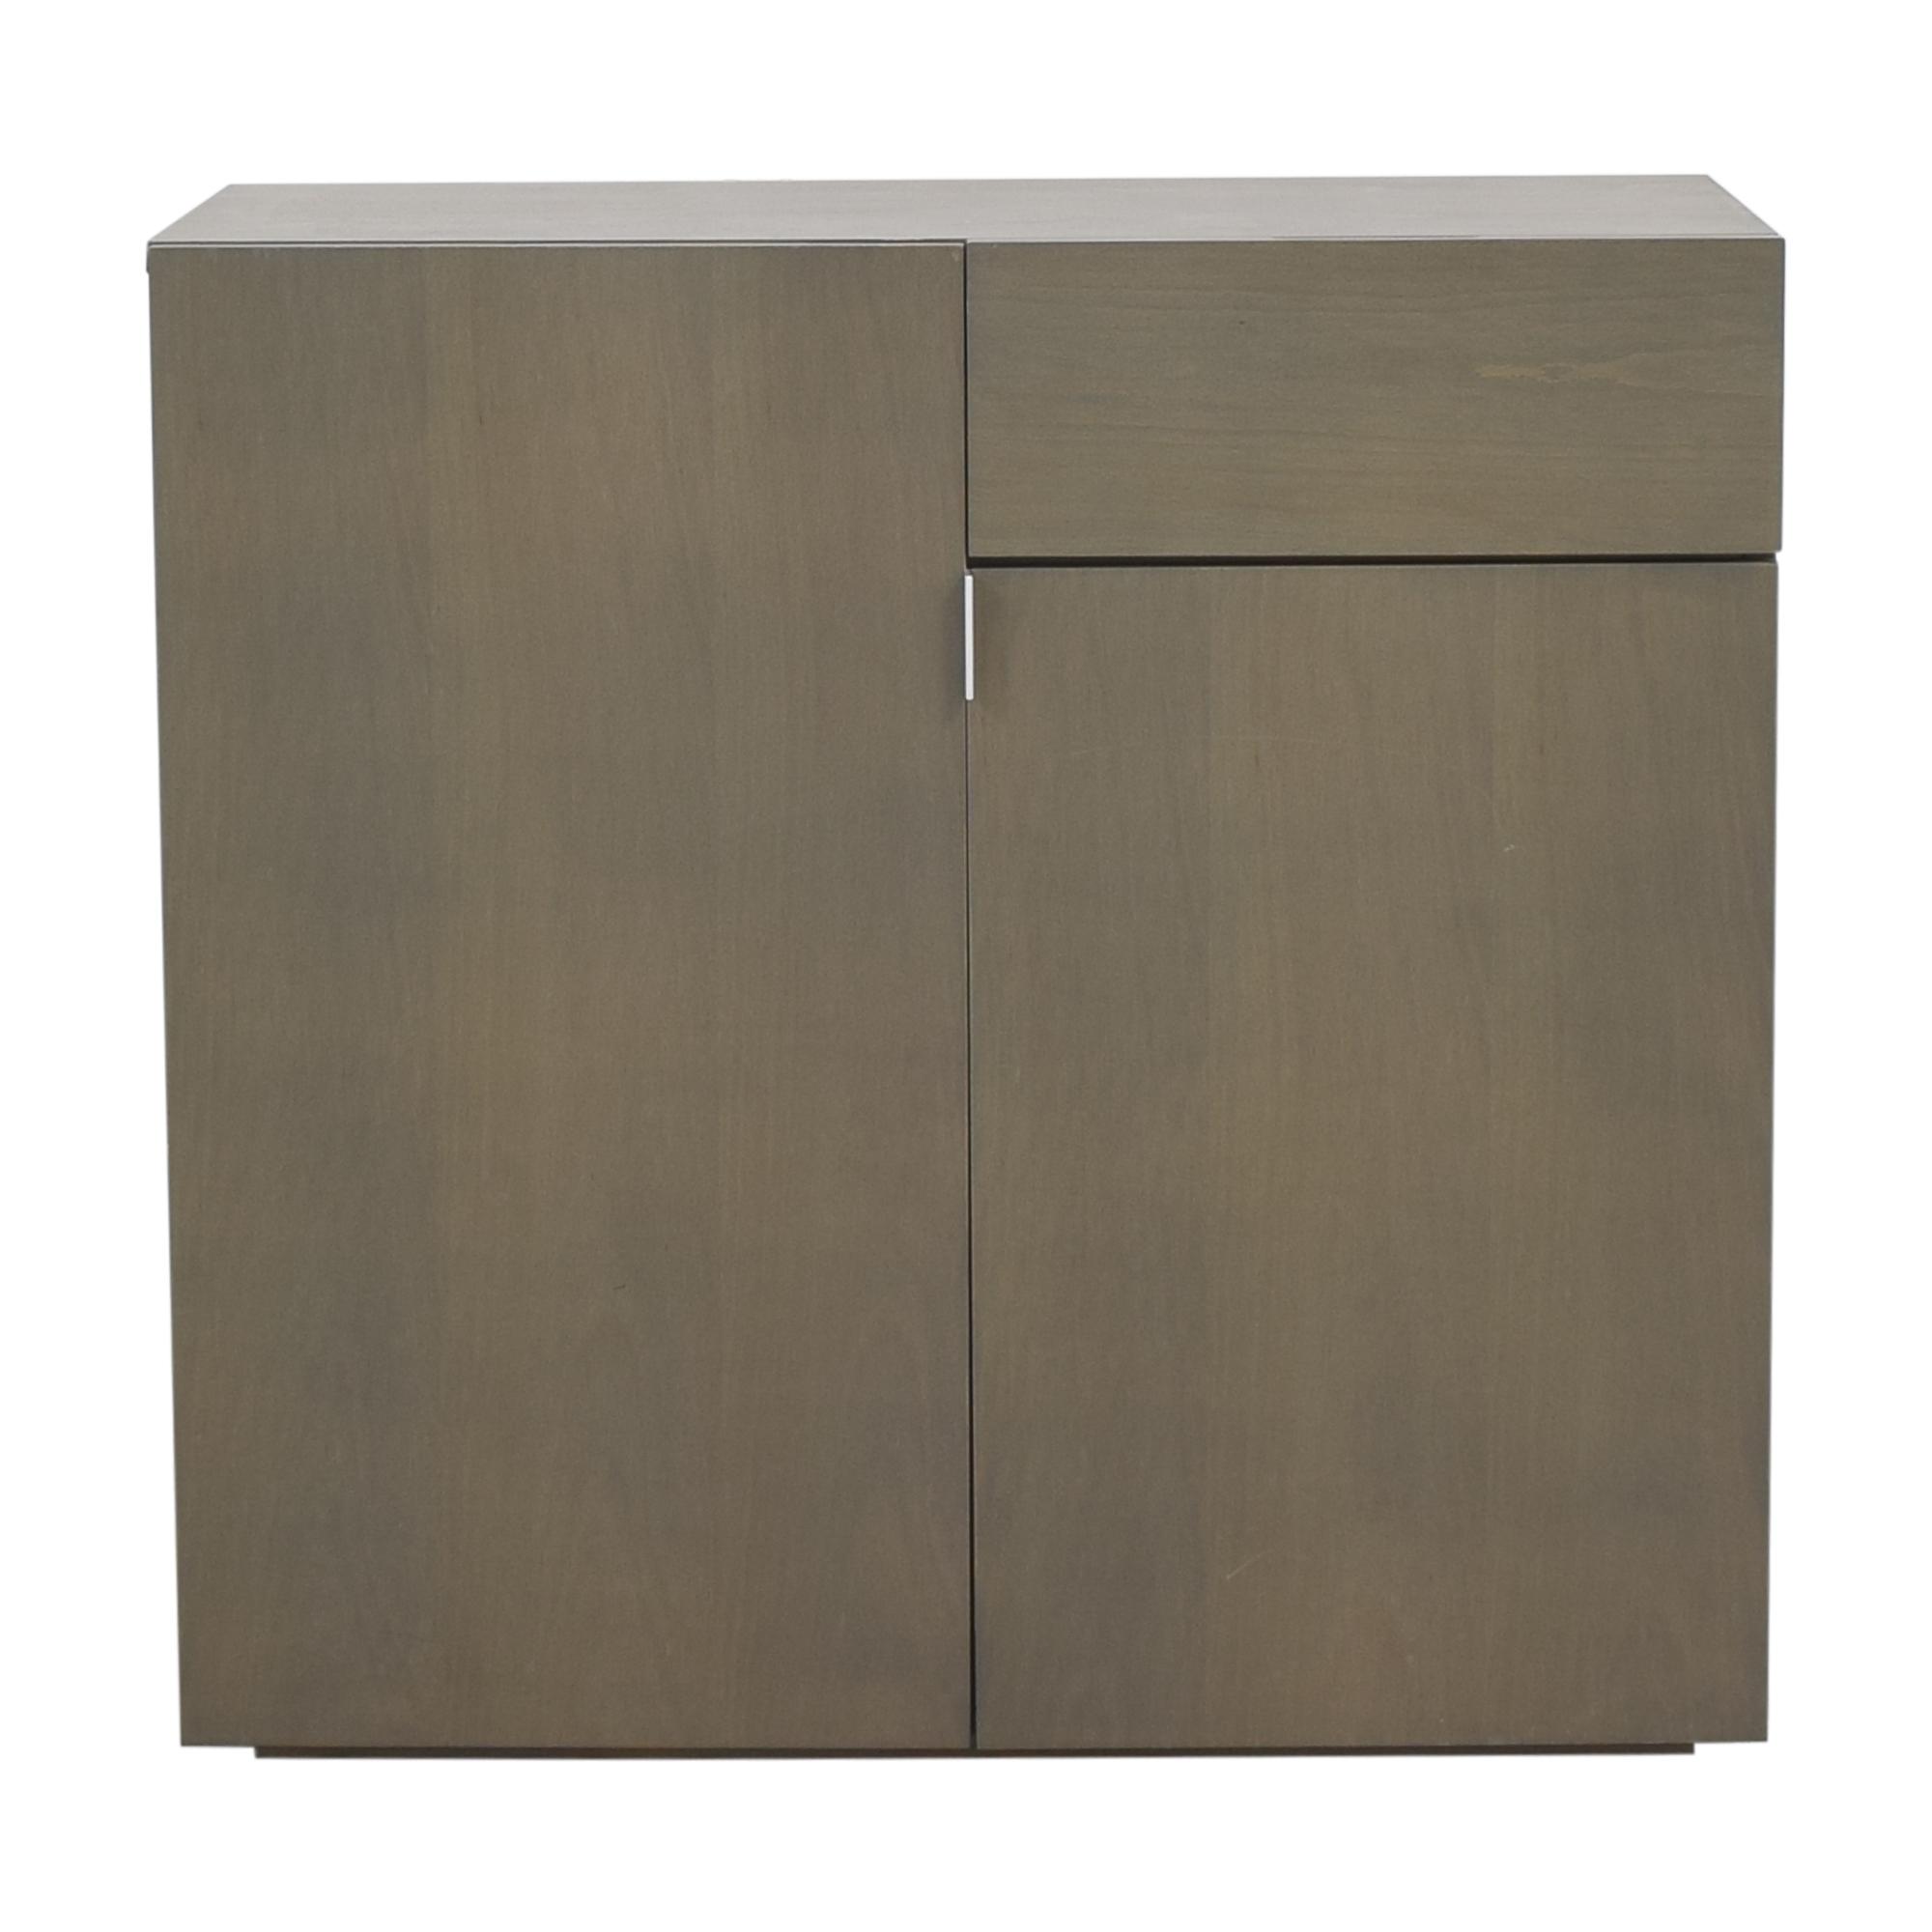 buy CB2 Swig Minibar CB2 Cabinets & Sideboards